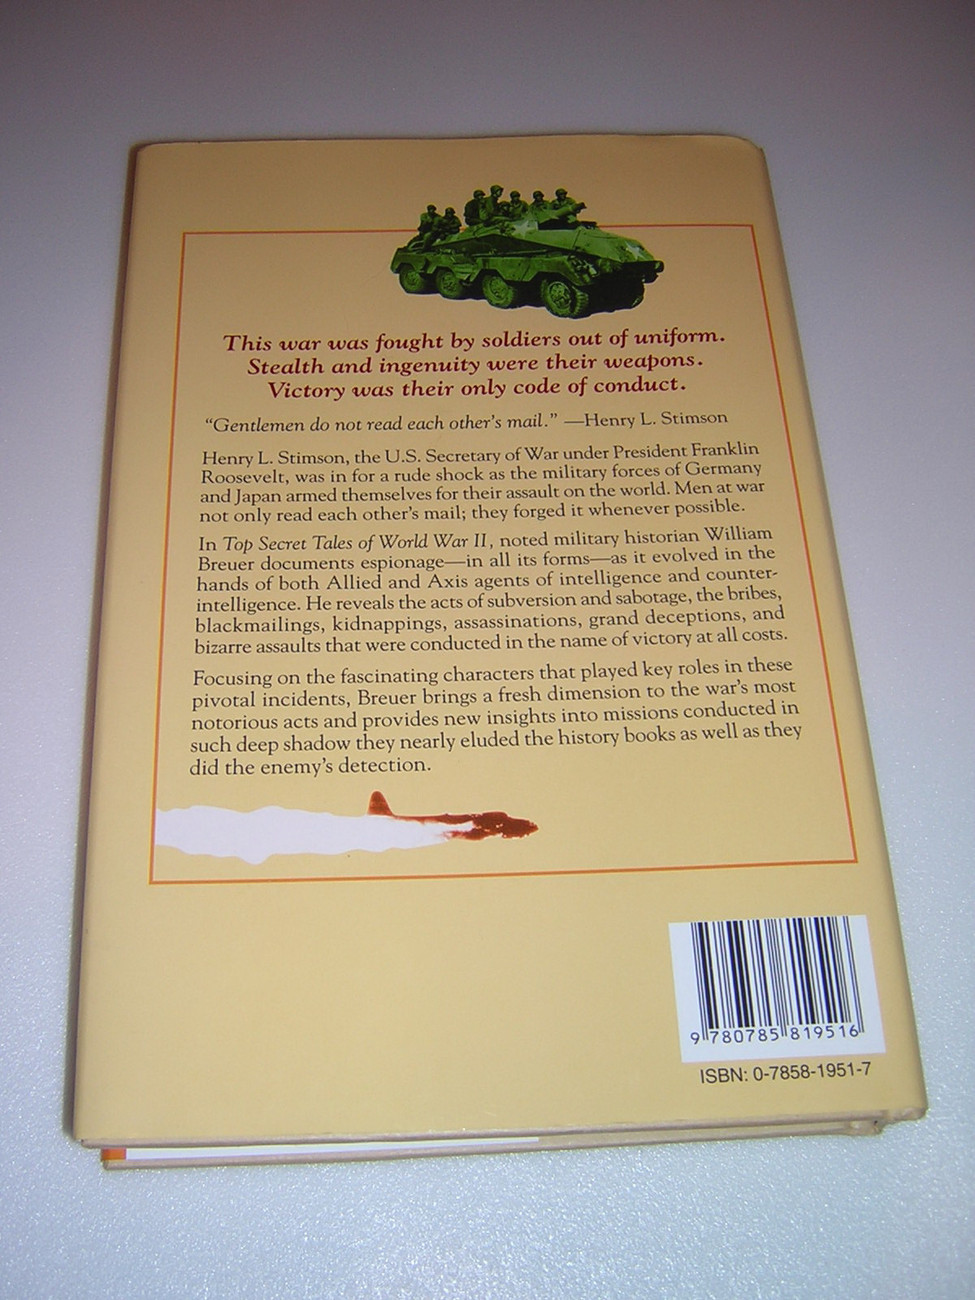 Top Secret Tales of World War II by William B. Breuer